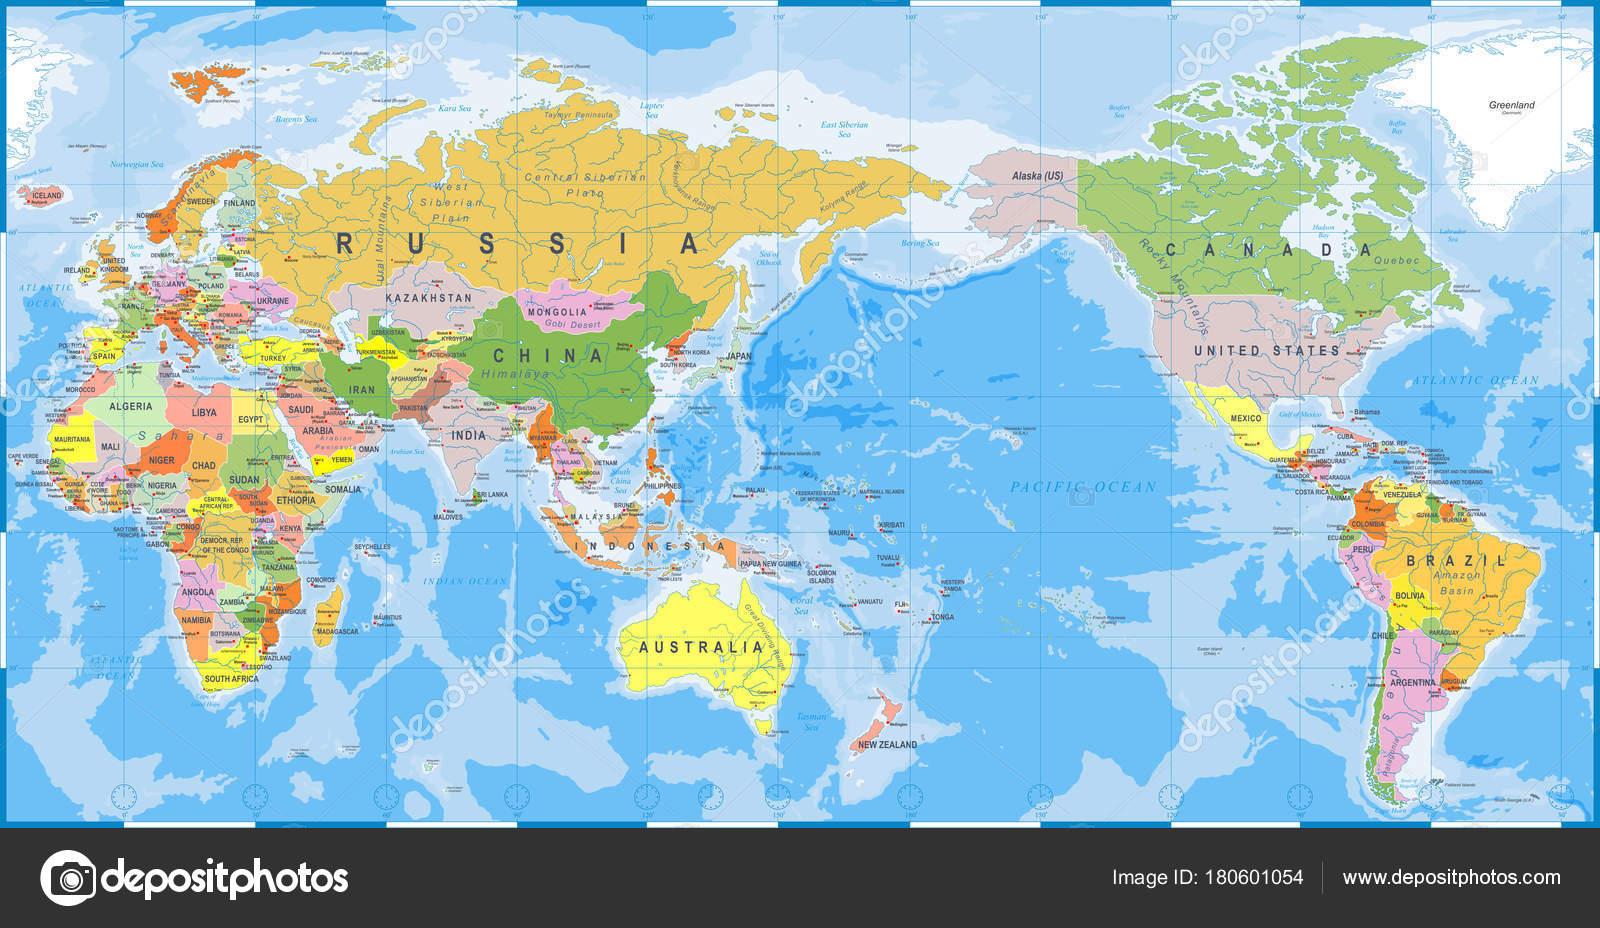 asien weltkarte Detaillierte Weltkarte Farbe   Asien im Zentrum — Stockvektor  asien weltkarte